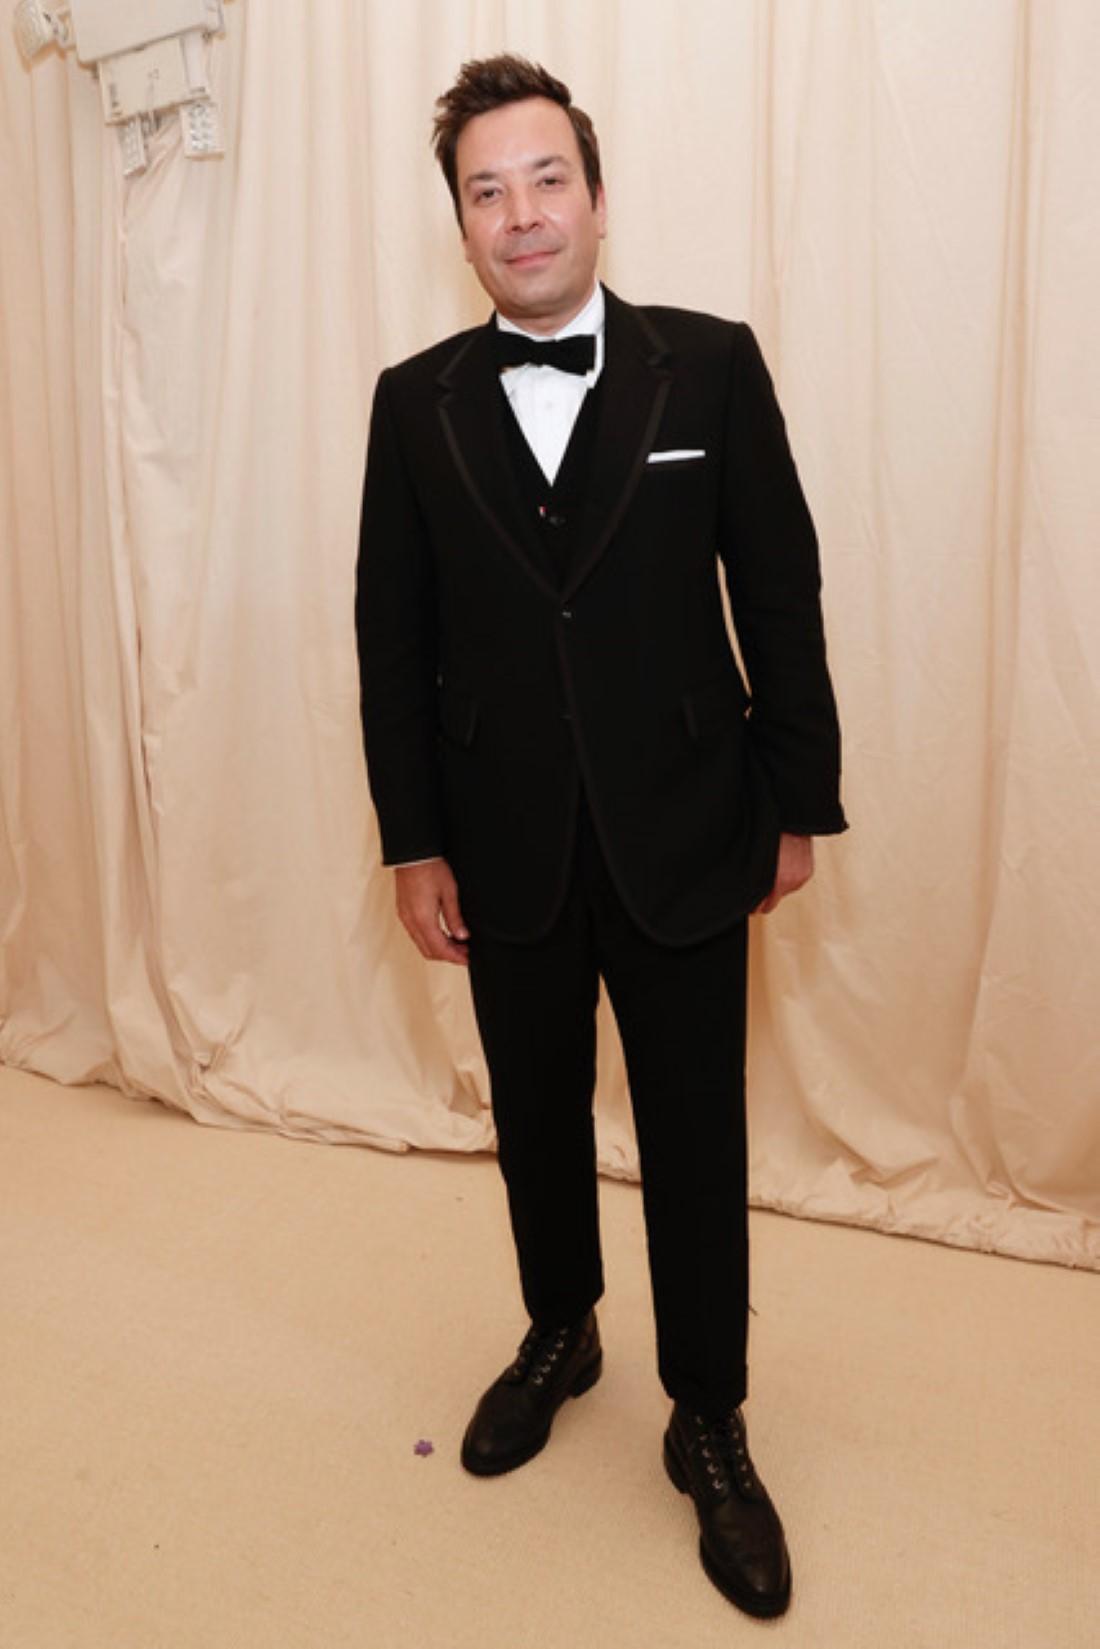 Met Gala 2021 - Jimmy Fallon x Thom Browne